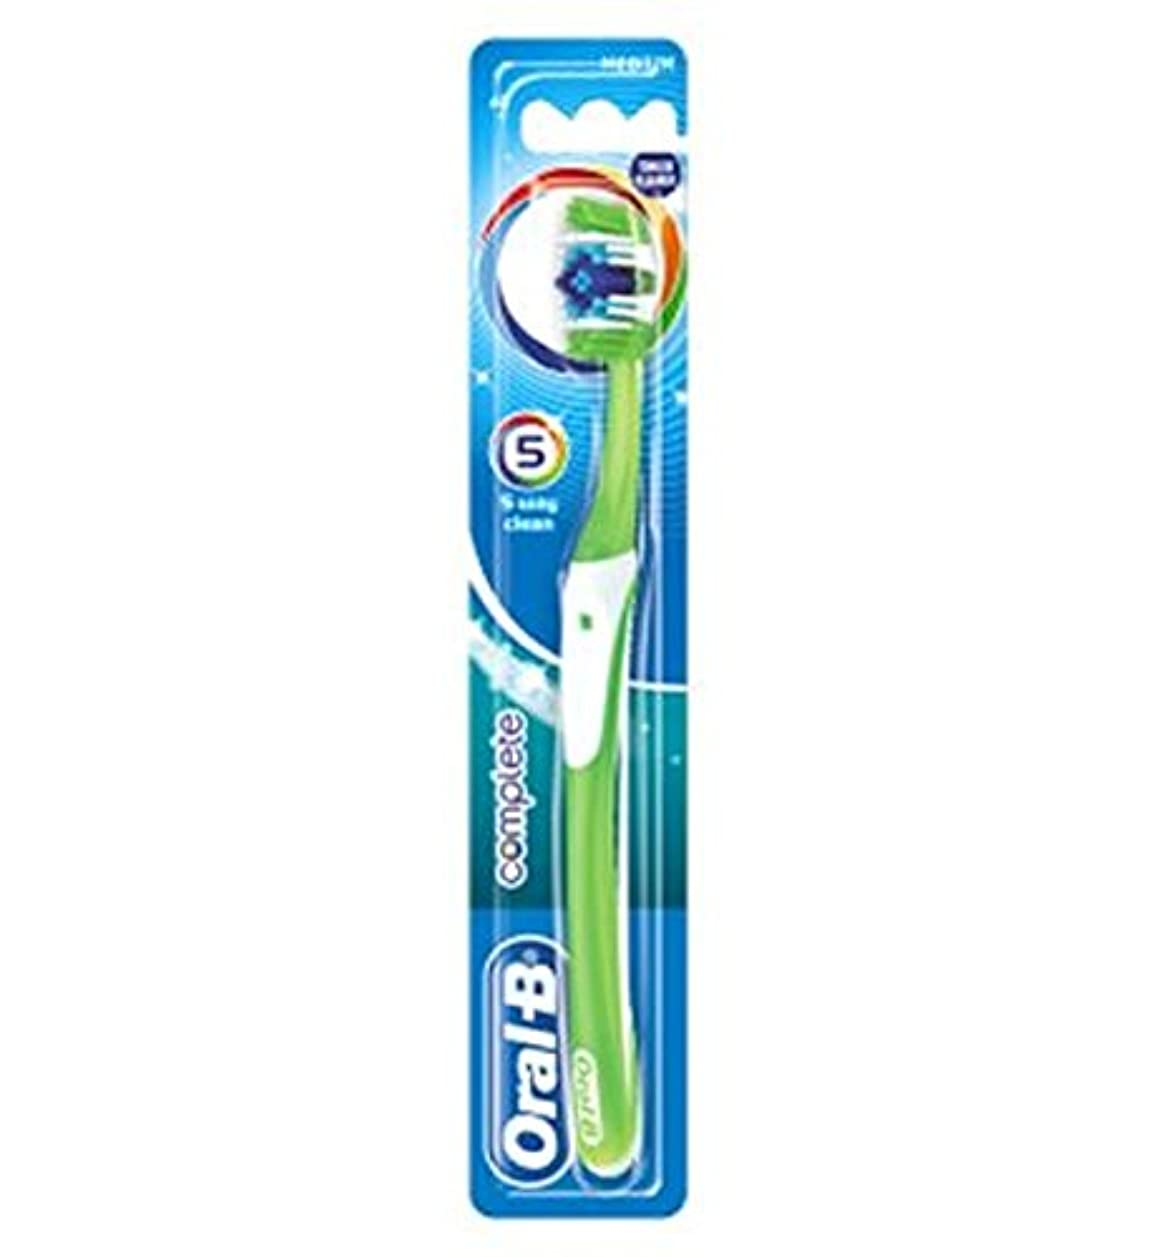 Oral-B Complete 5 Way Clean Medium Manual Toothbrush - オーラルBの完全な5道クリーンなメディアの手動歯ブラシ (Oral B) [並行輸入品]